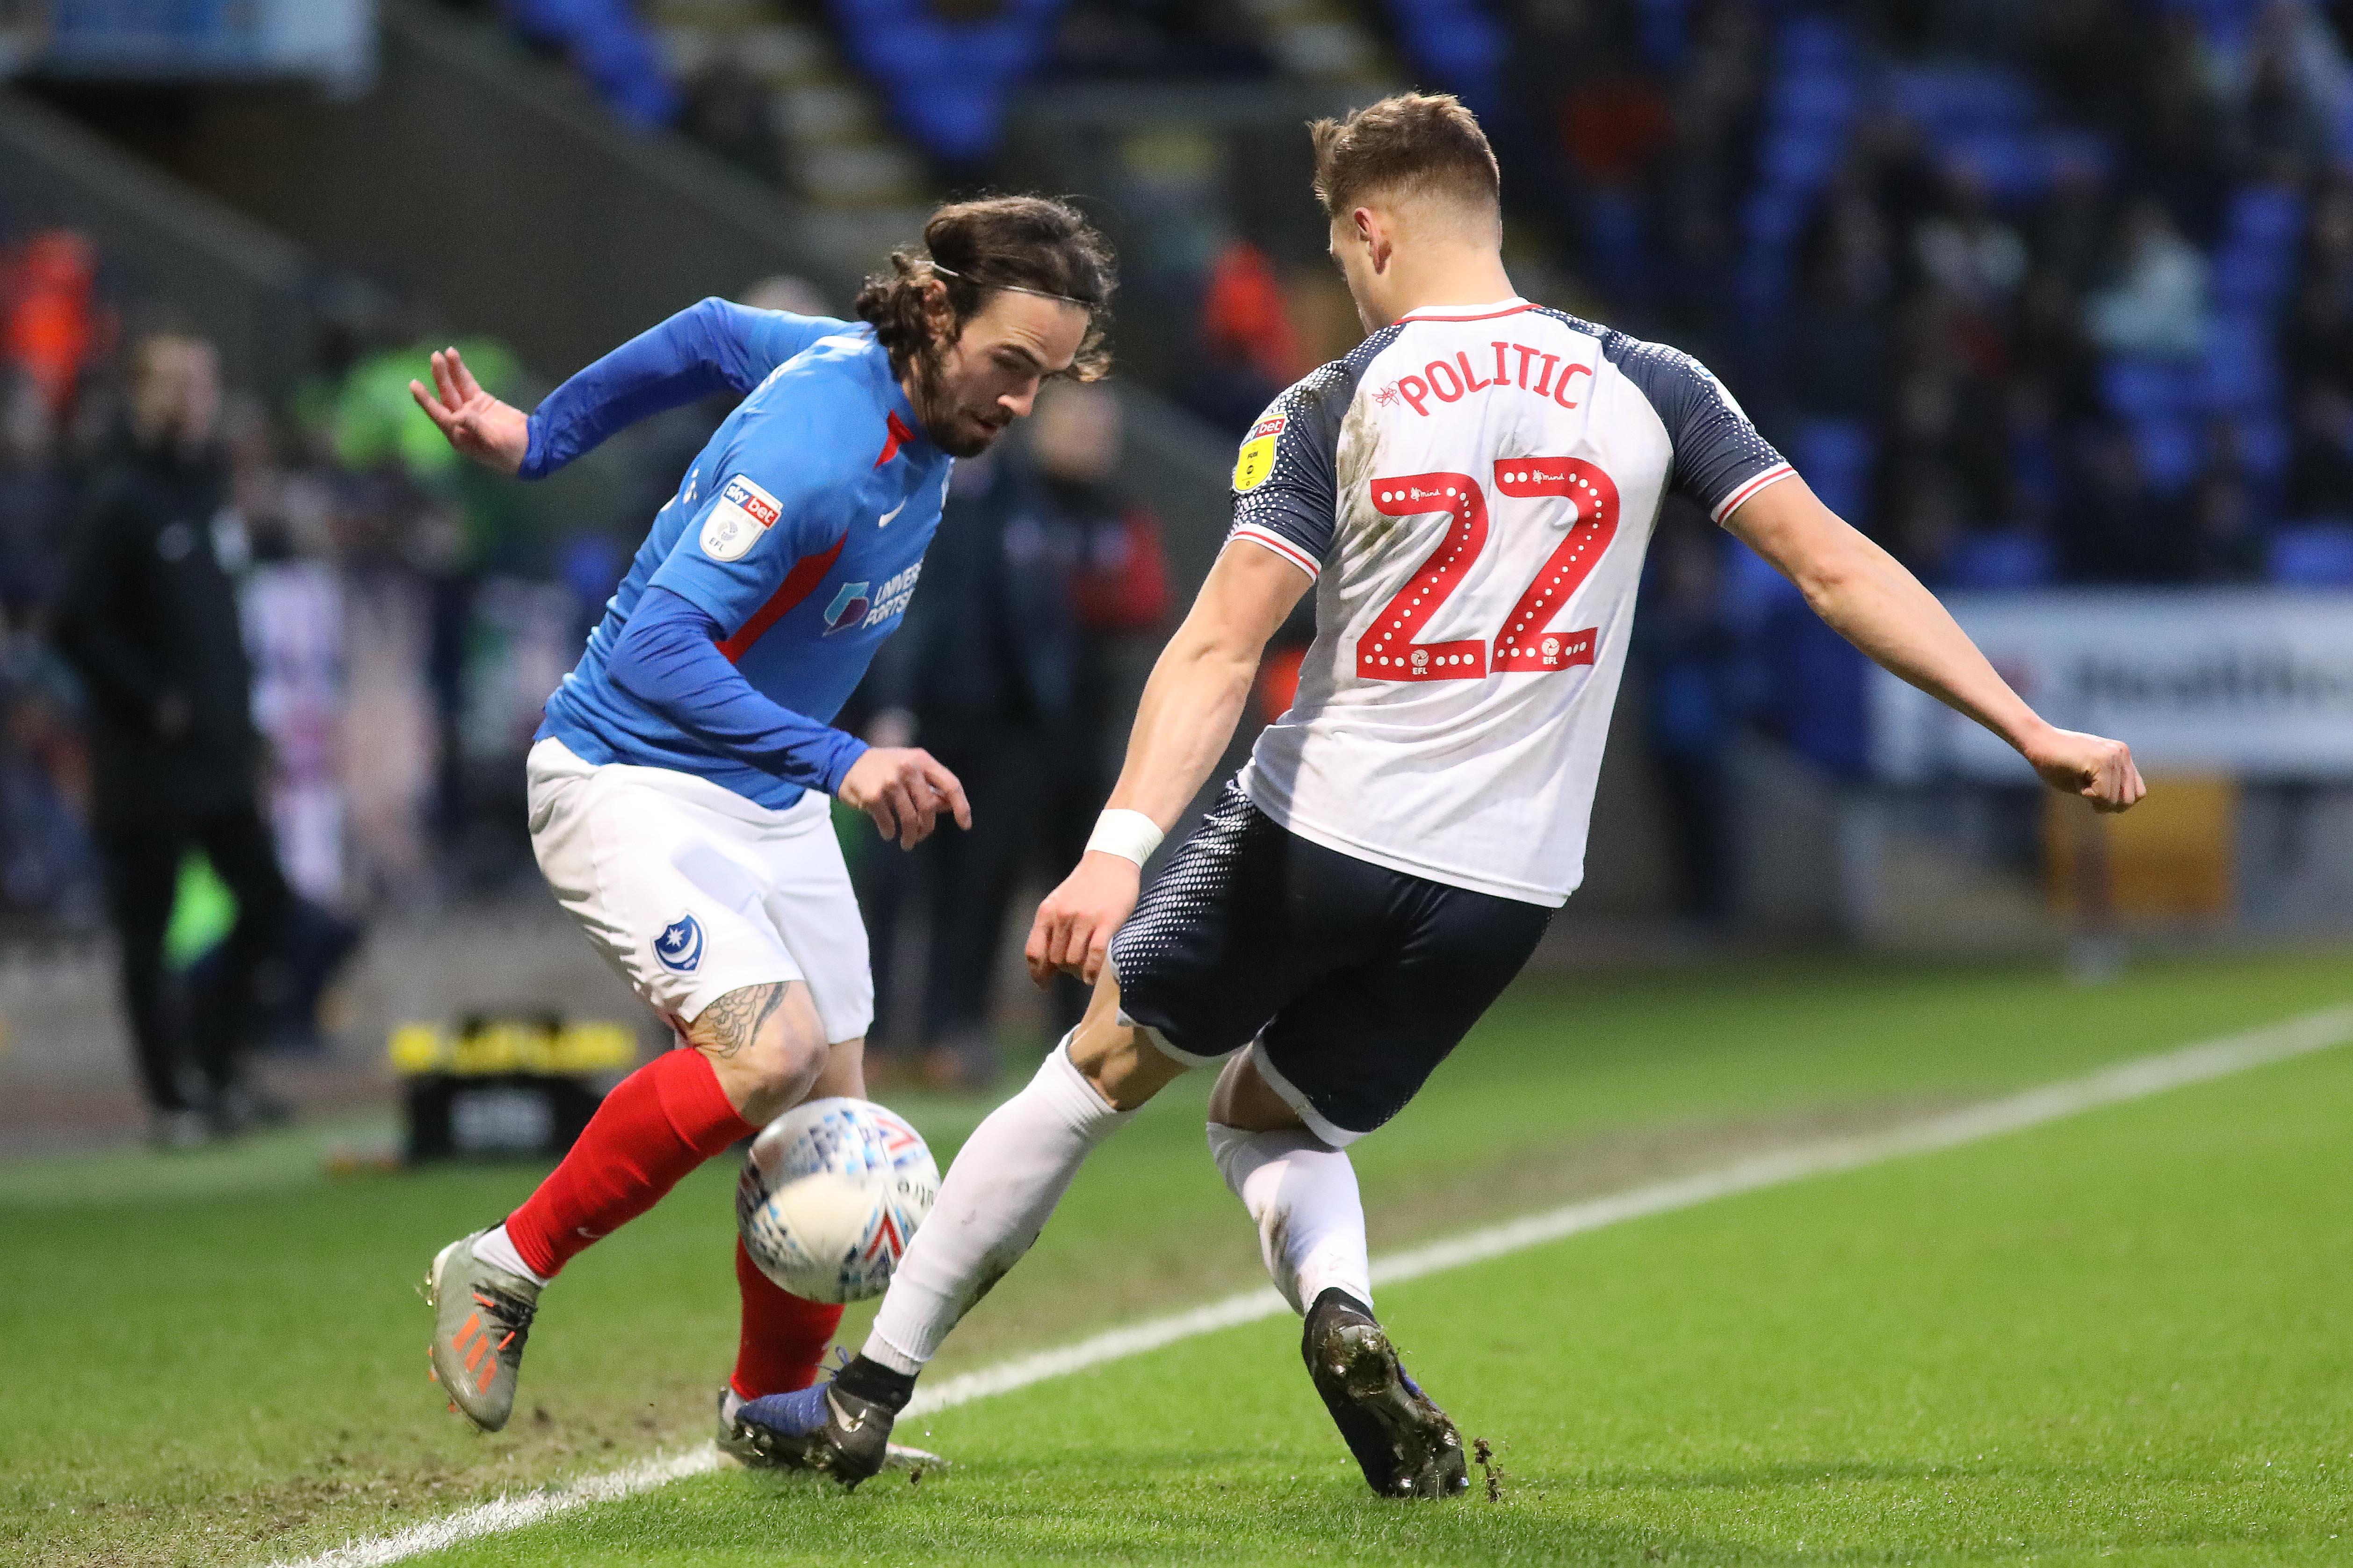 Bolton Wanderers v Portsmouth - Sky Bet League One